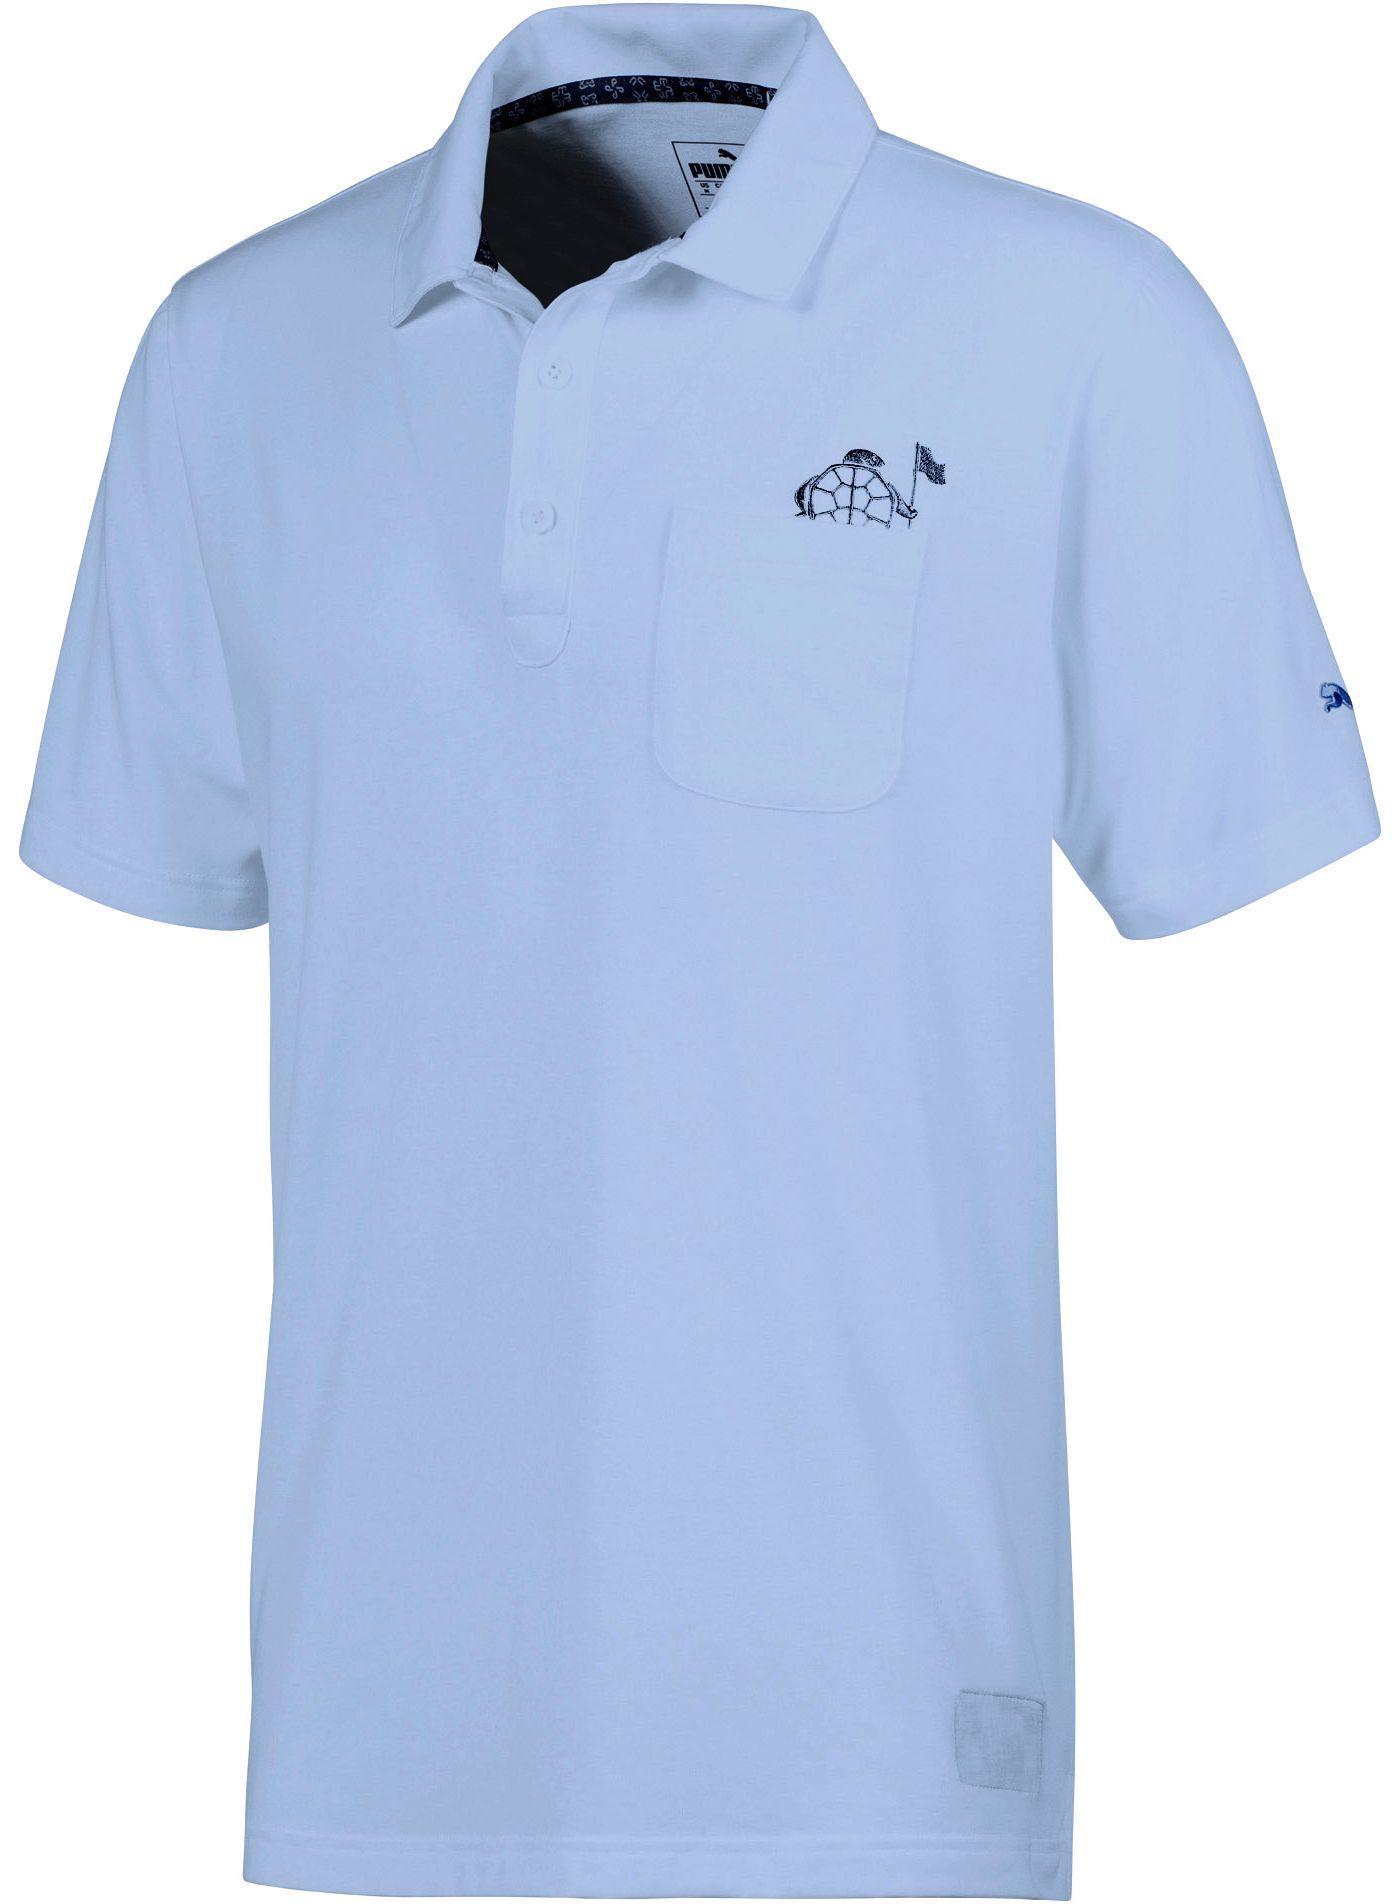 PUMA Men's Slow Play Golf Polo